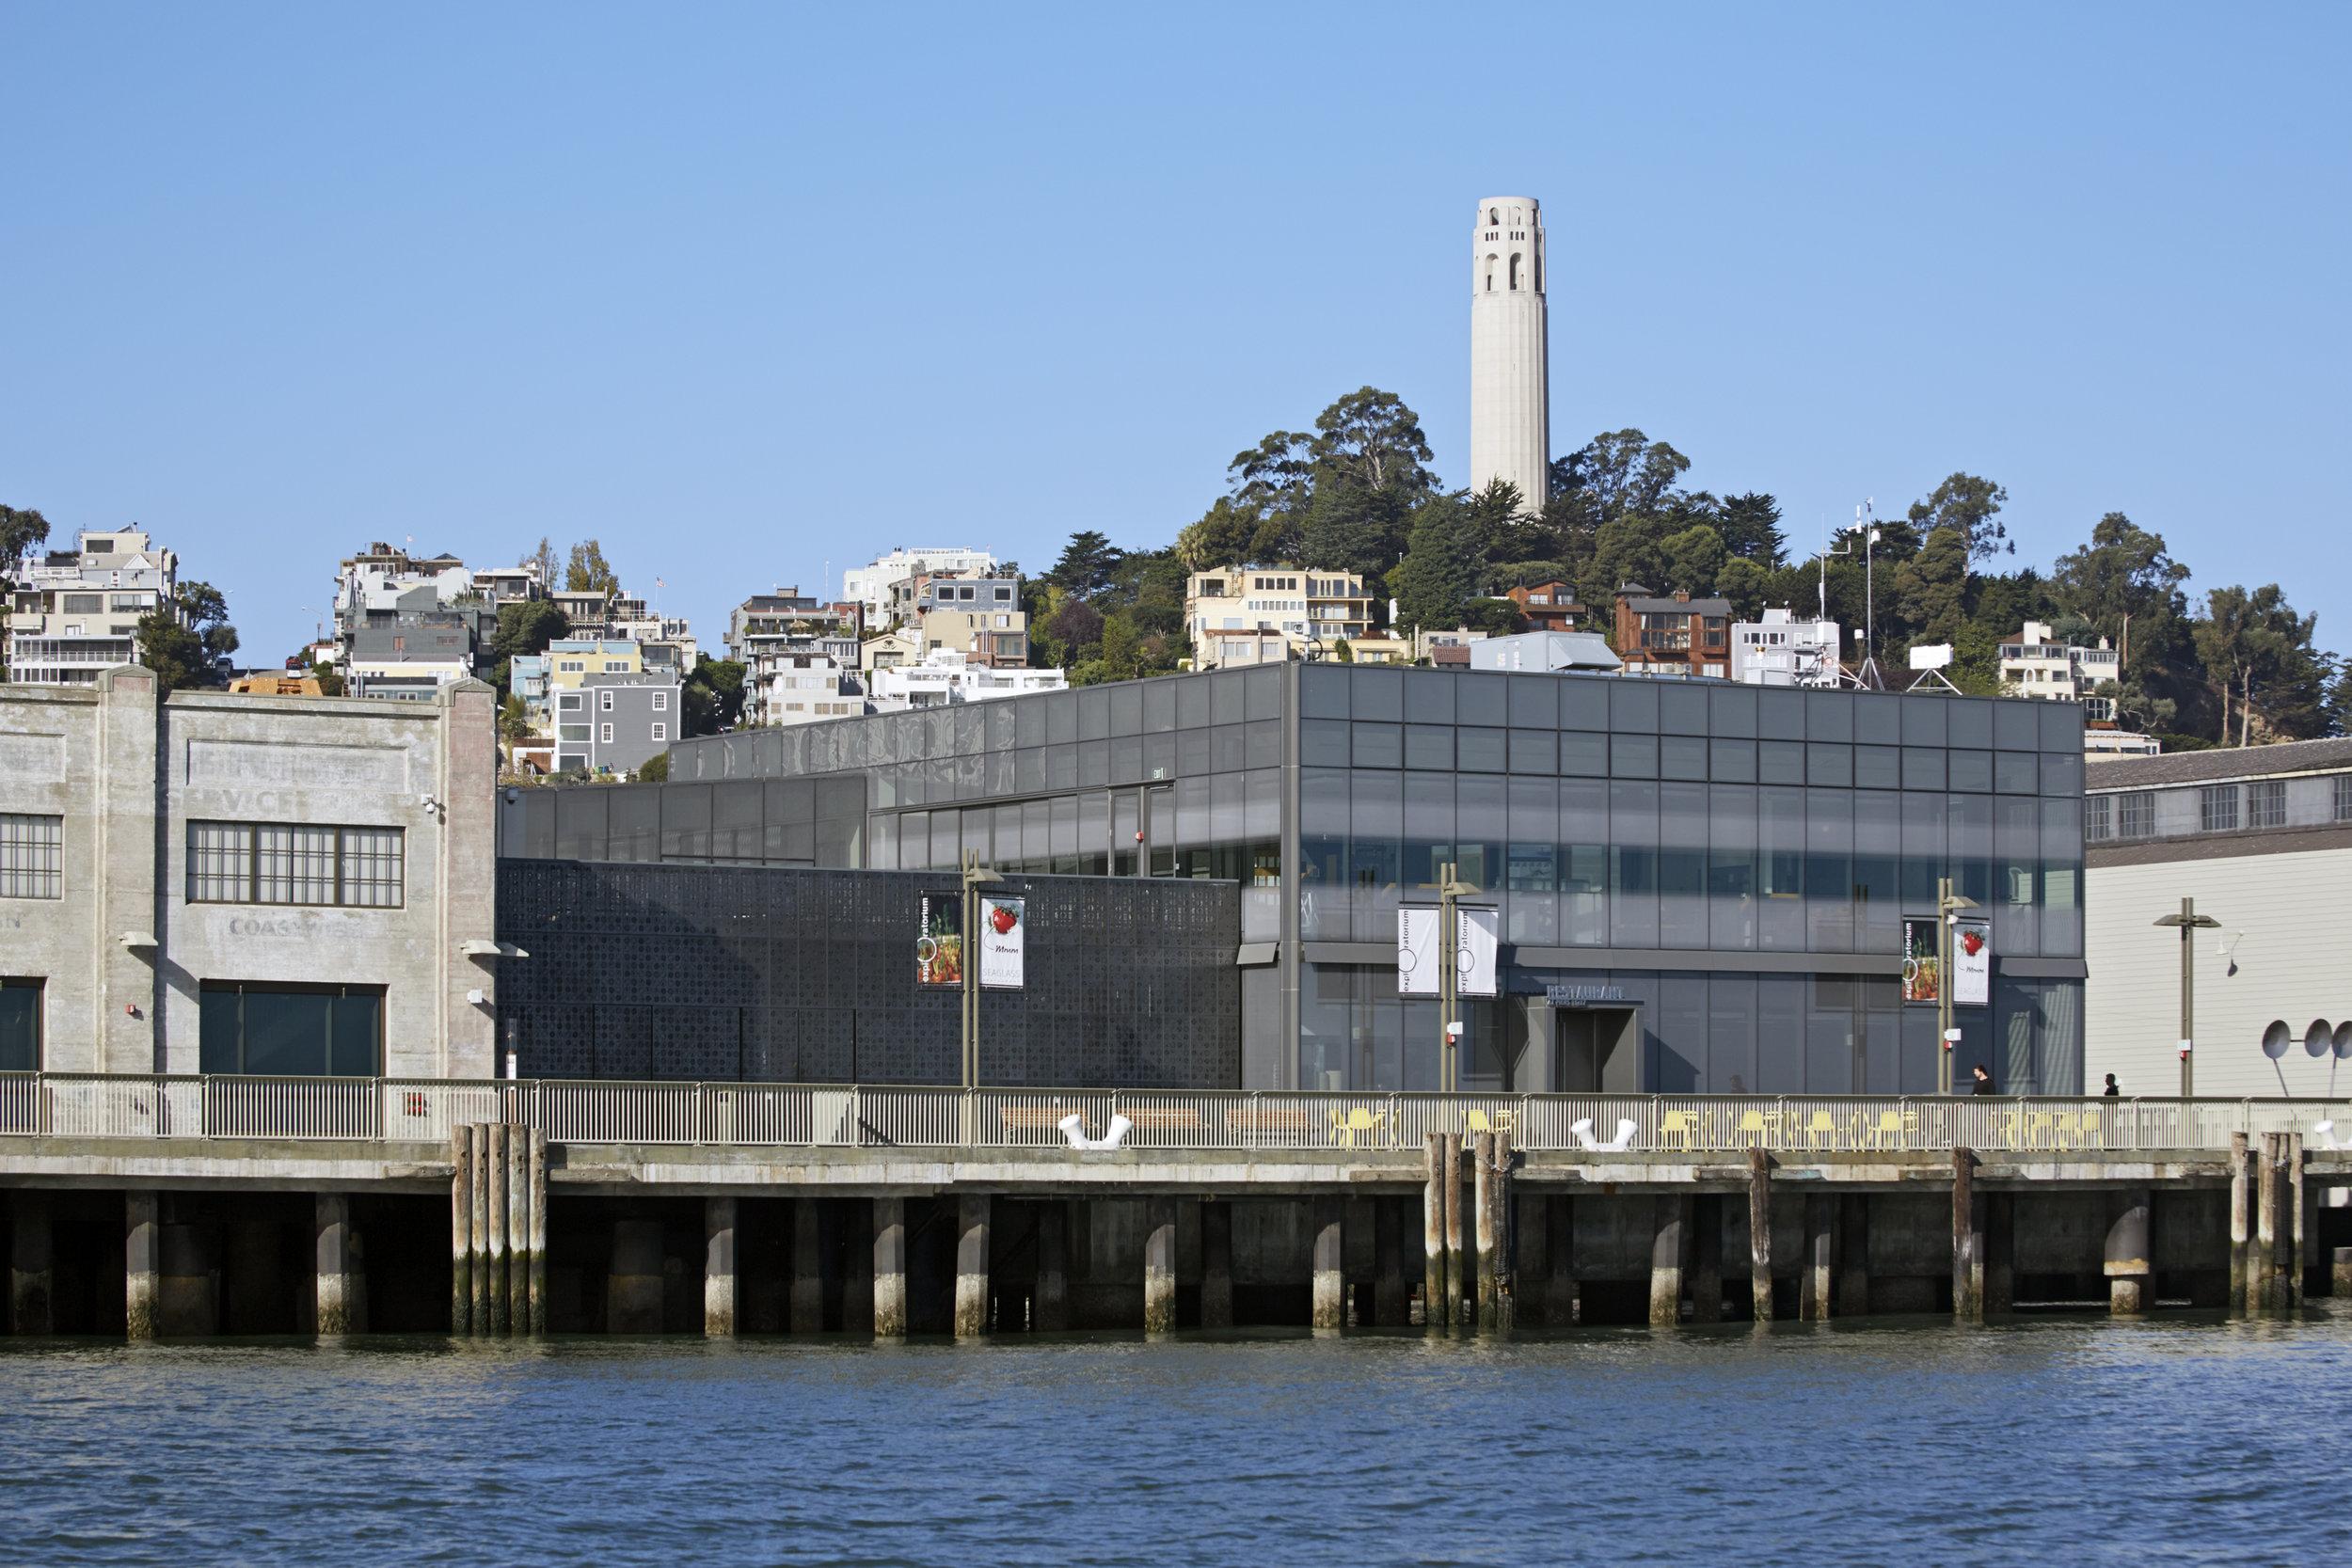 Observatory of Exploratorium, San Francisco. Image courtesy of Exploratorium, copyright Bruce Damonte